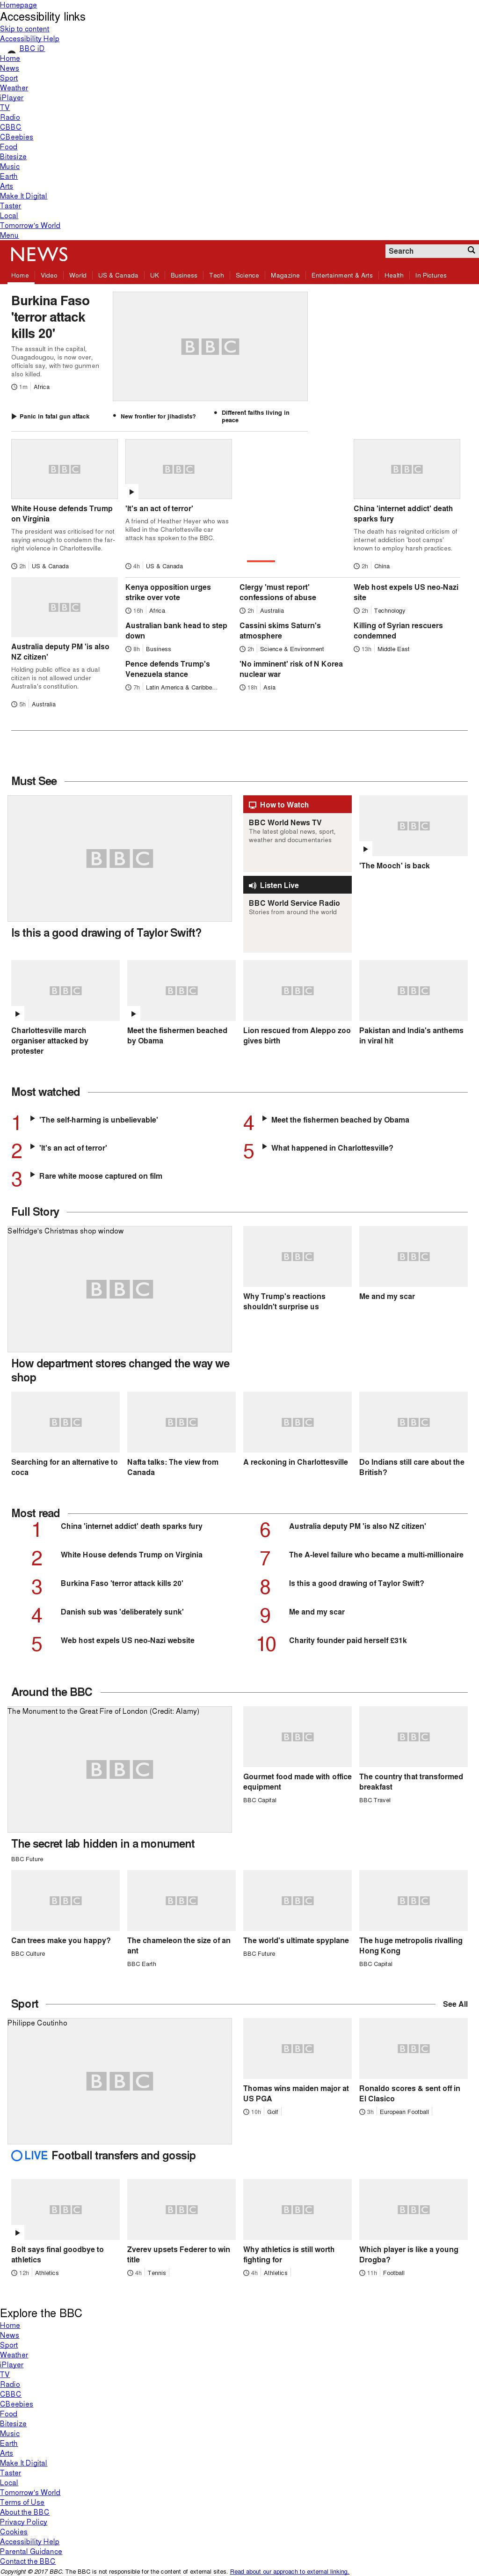 BBC at Monday Aug. 14, 2017, 10 a.m. UTC